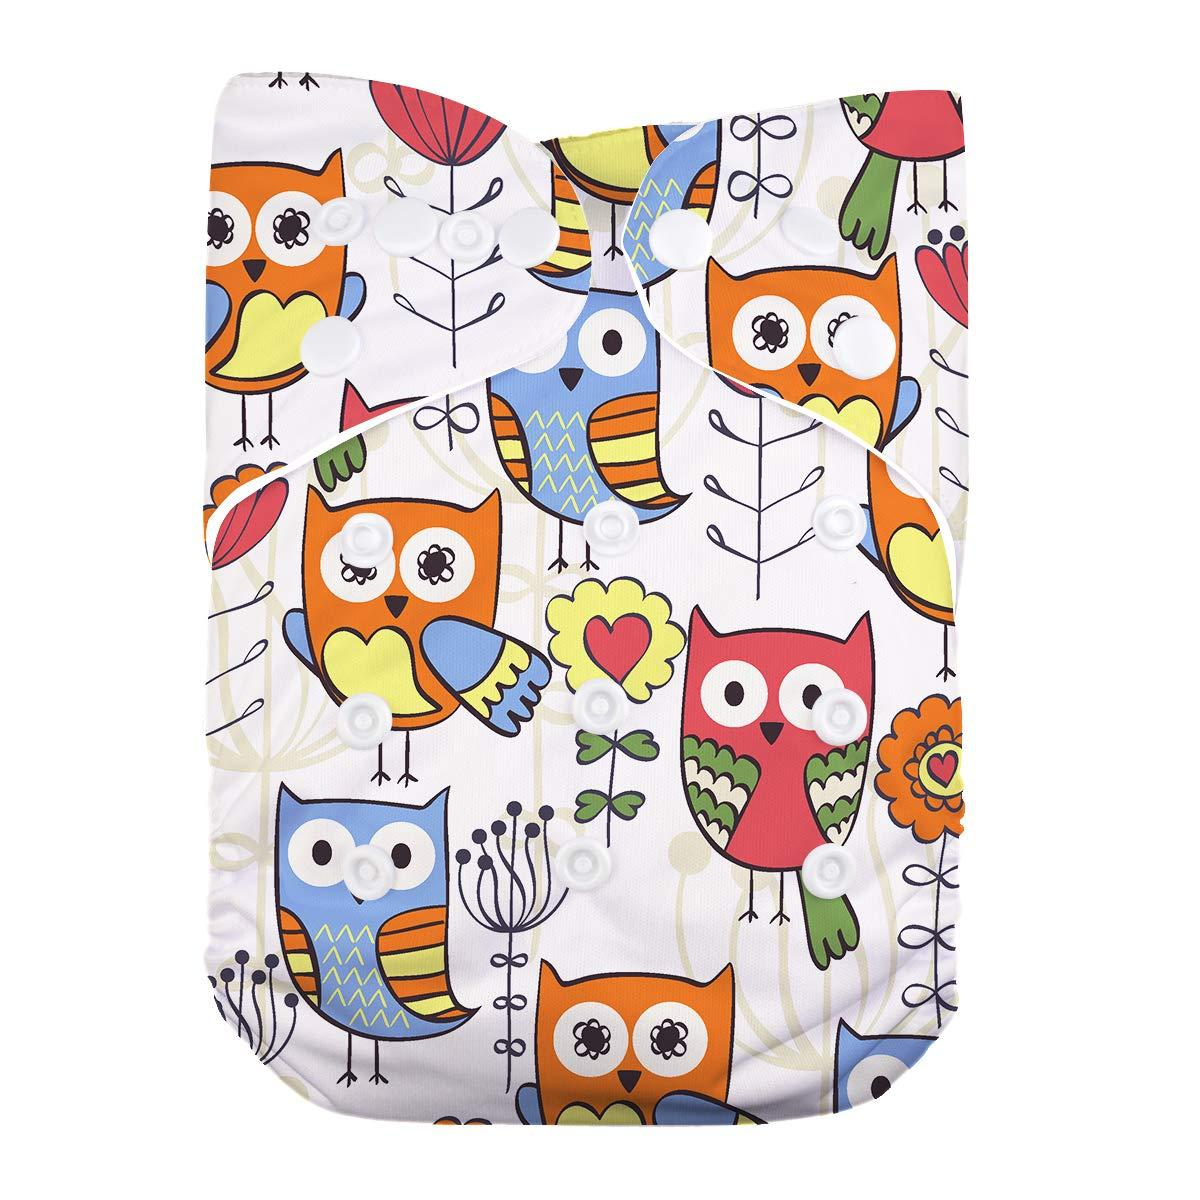 LilBit Baby 6pcs Inserts and 6 pcs Washable Printed Cloth Diapers LBTZH13-UK